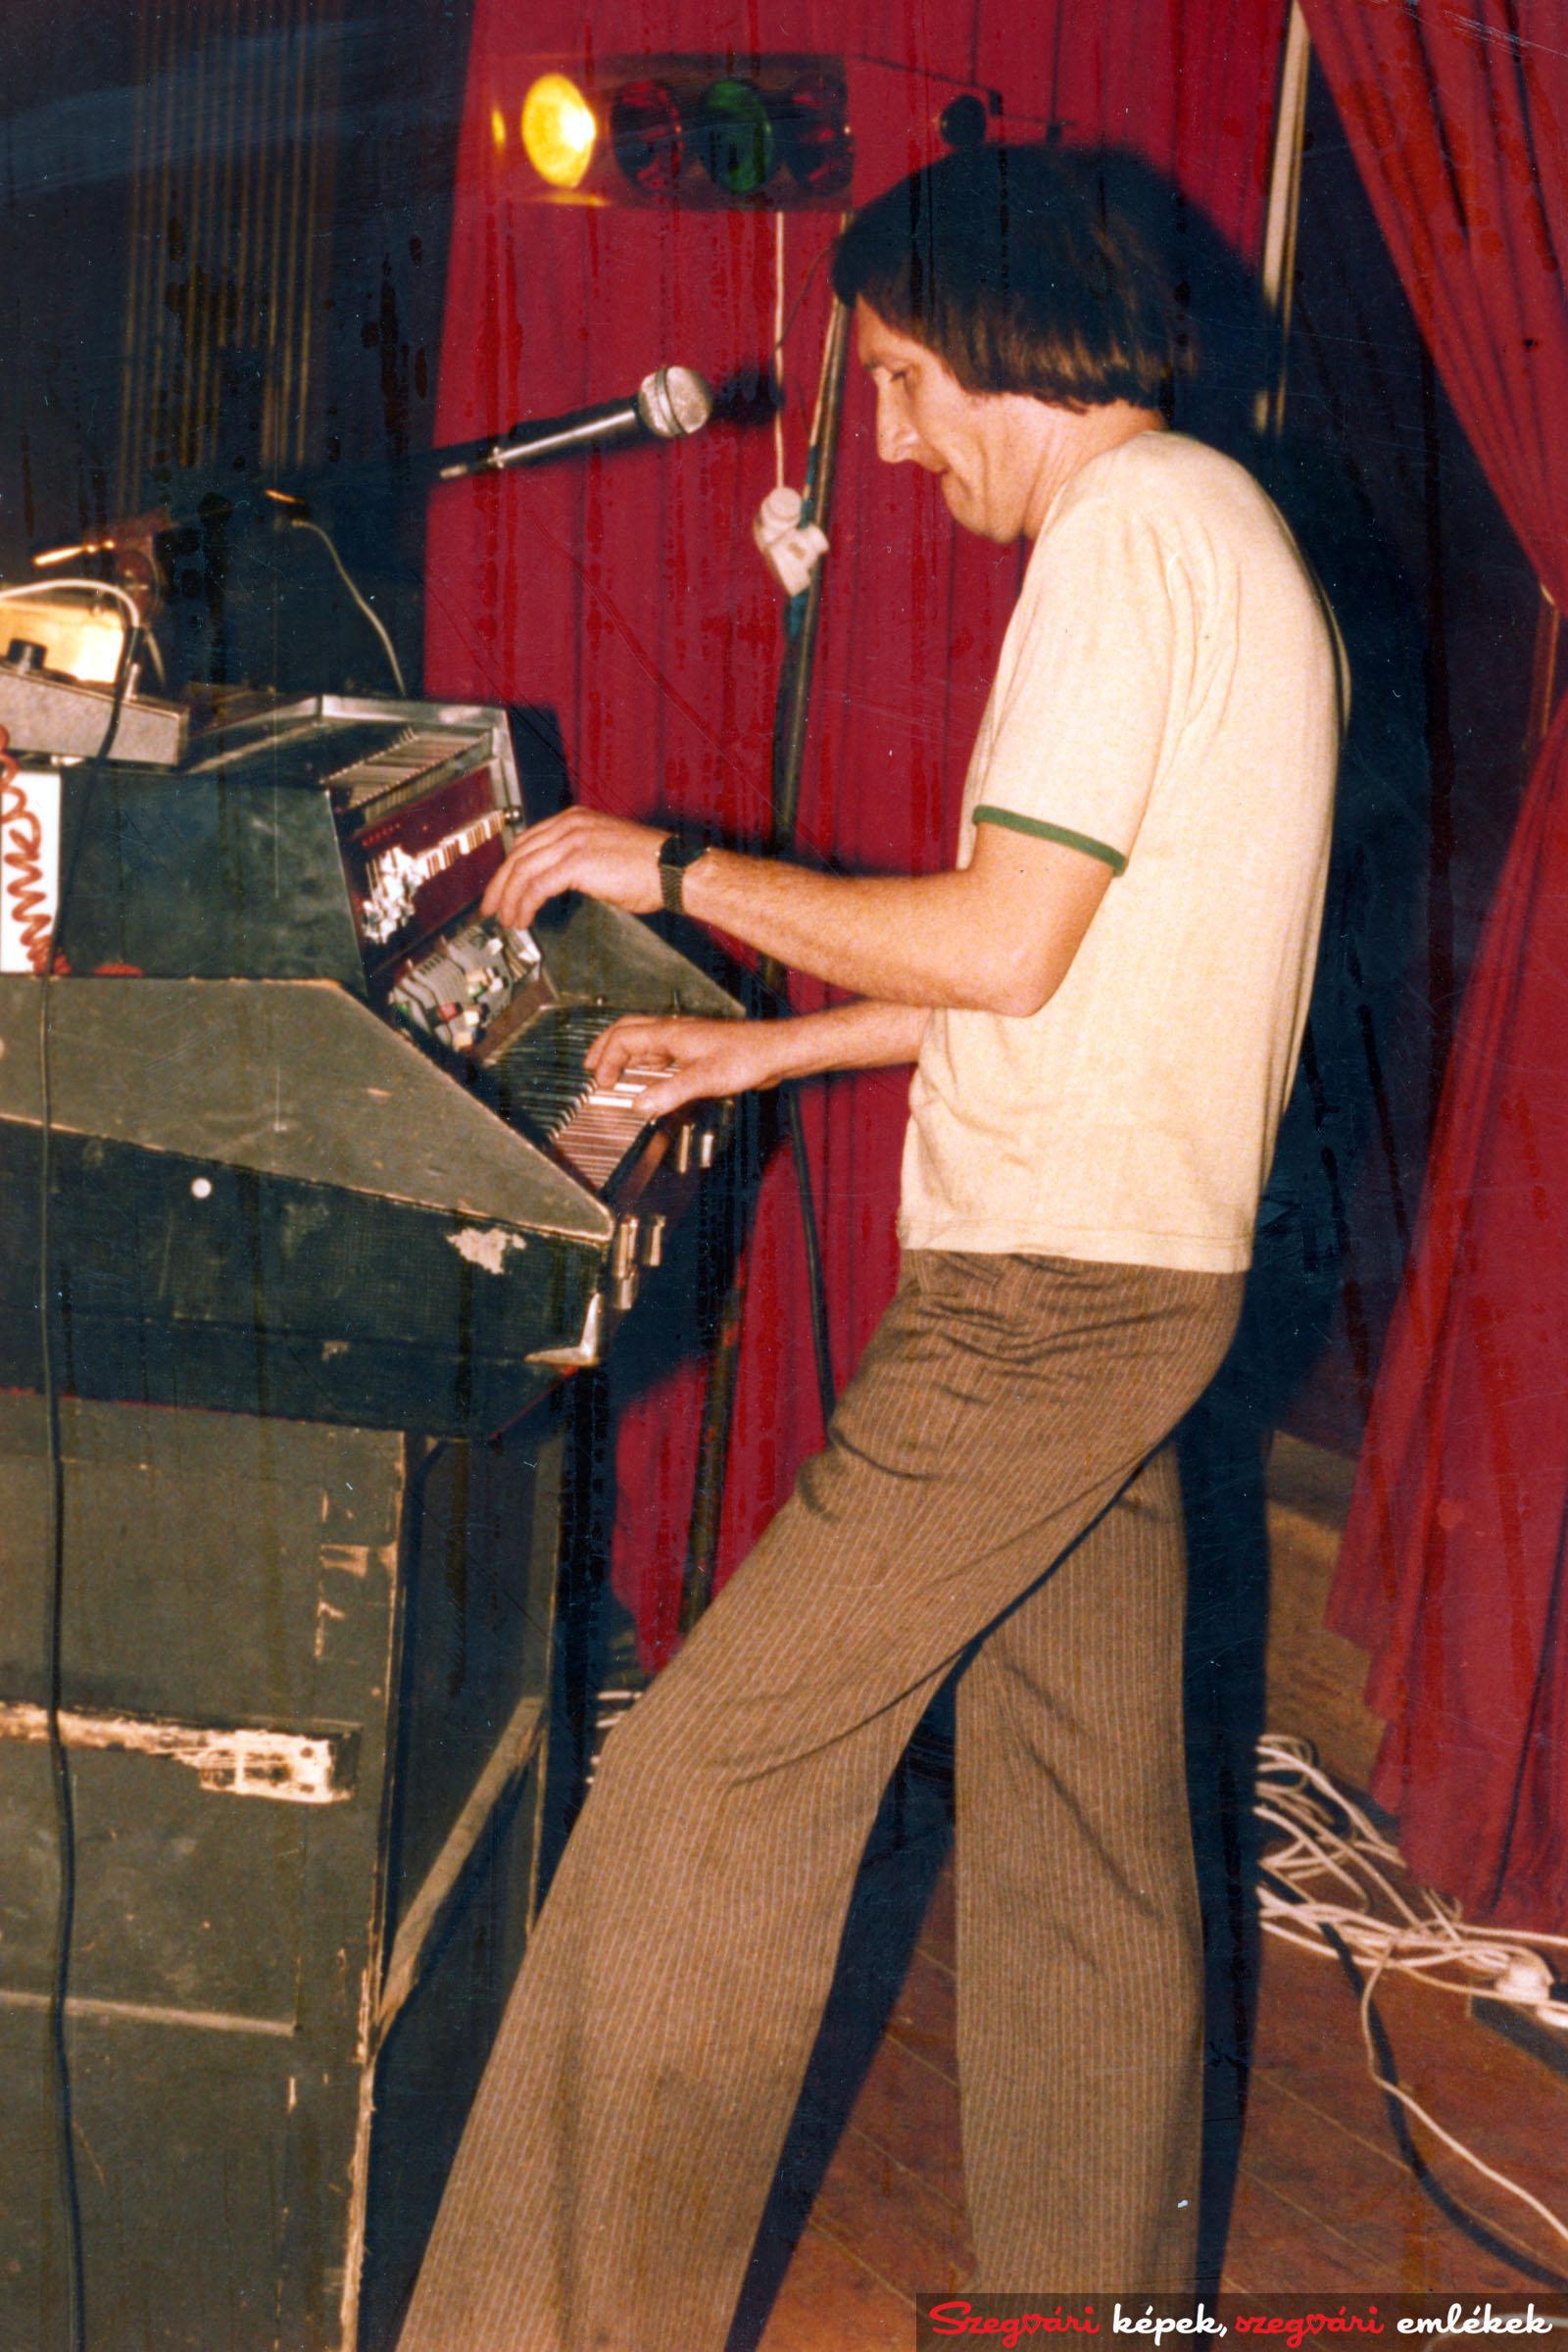 062 Lézer Rock 1980-1983. 005 – Fekete tulipántól a Lézerig,